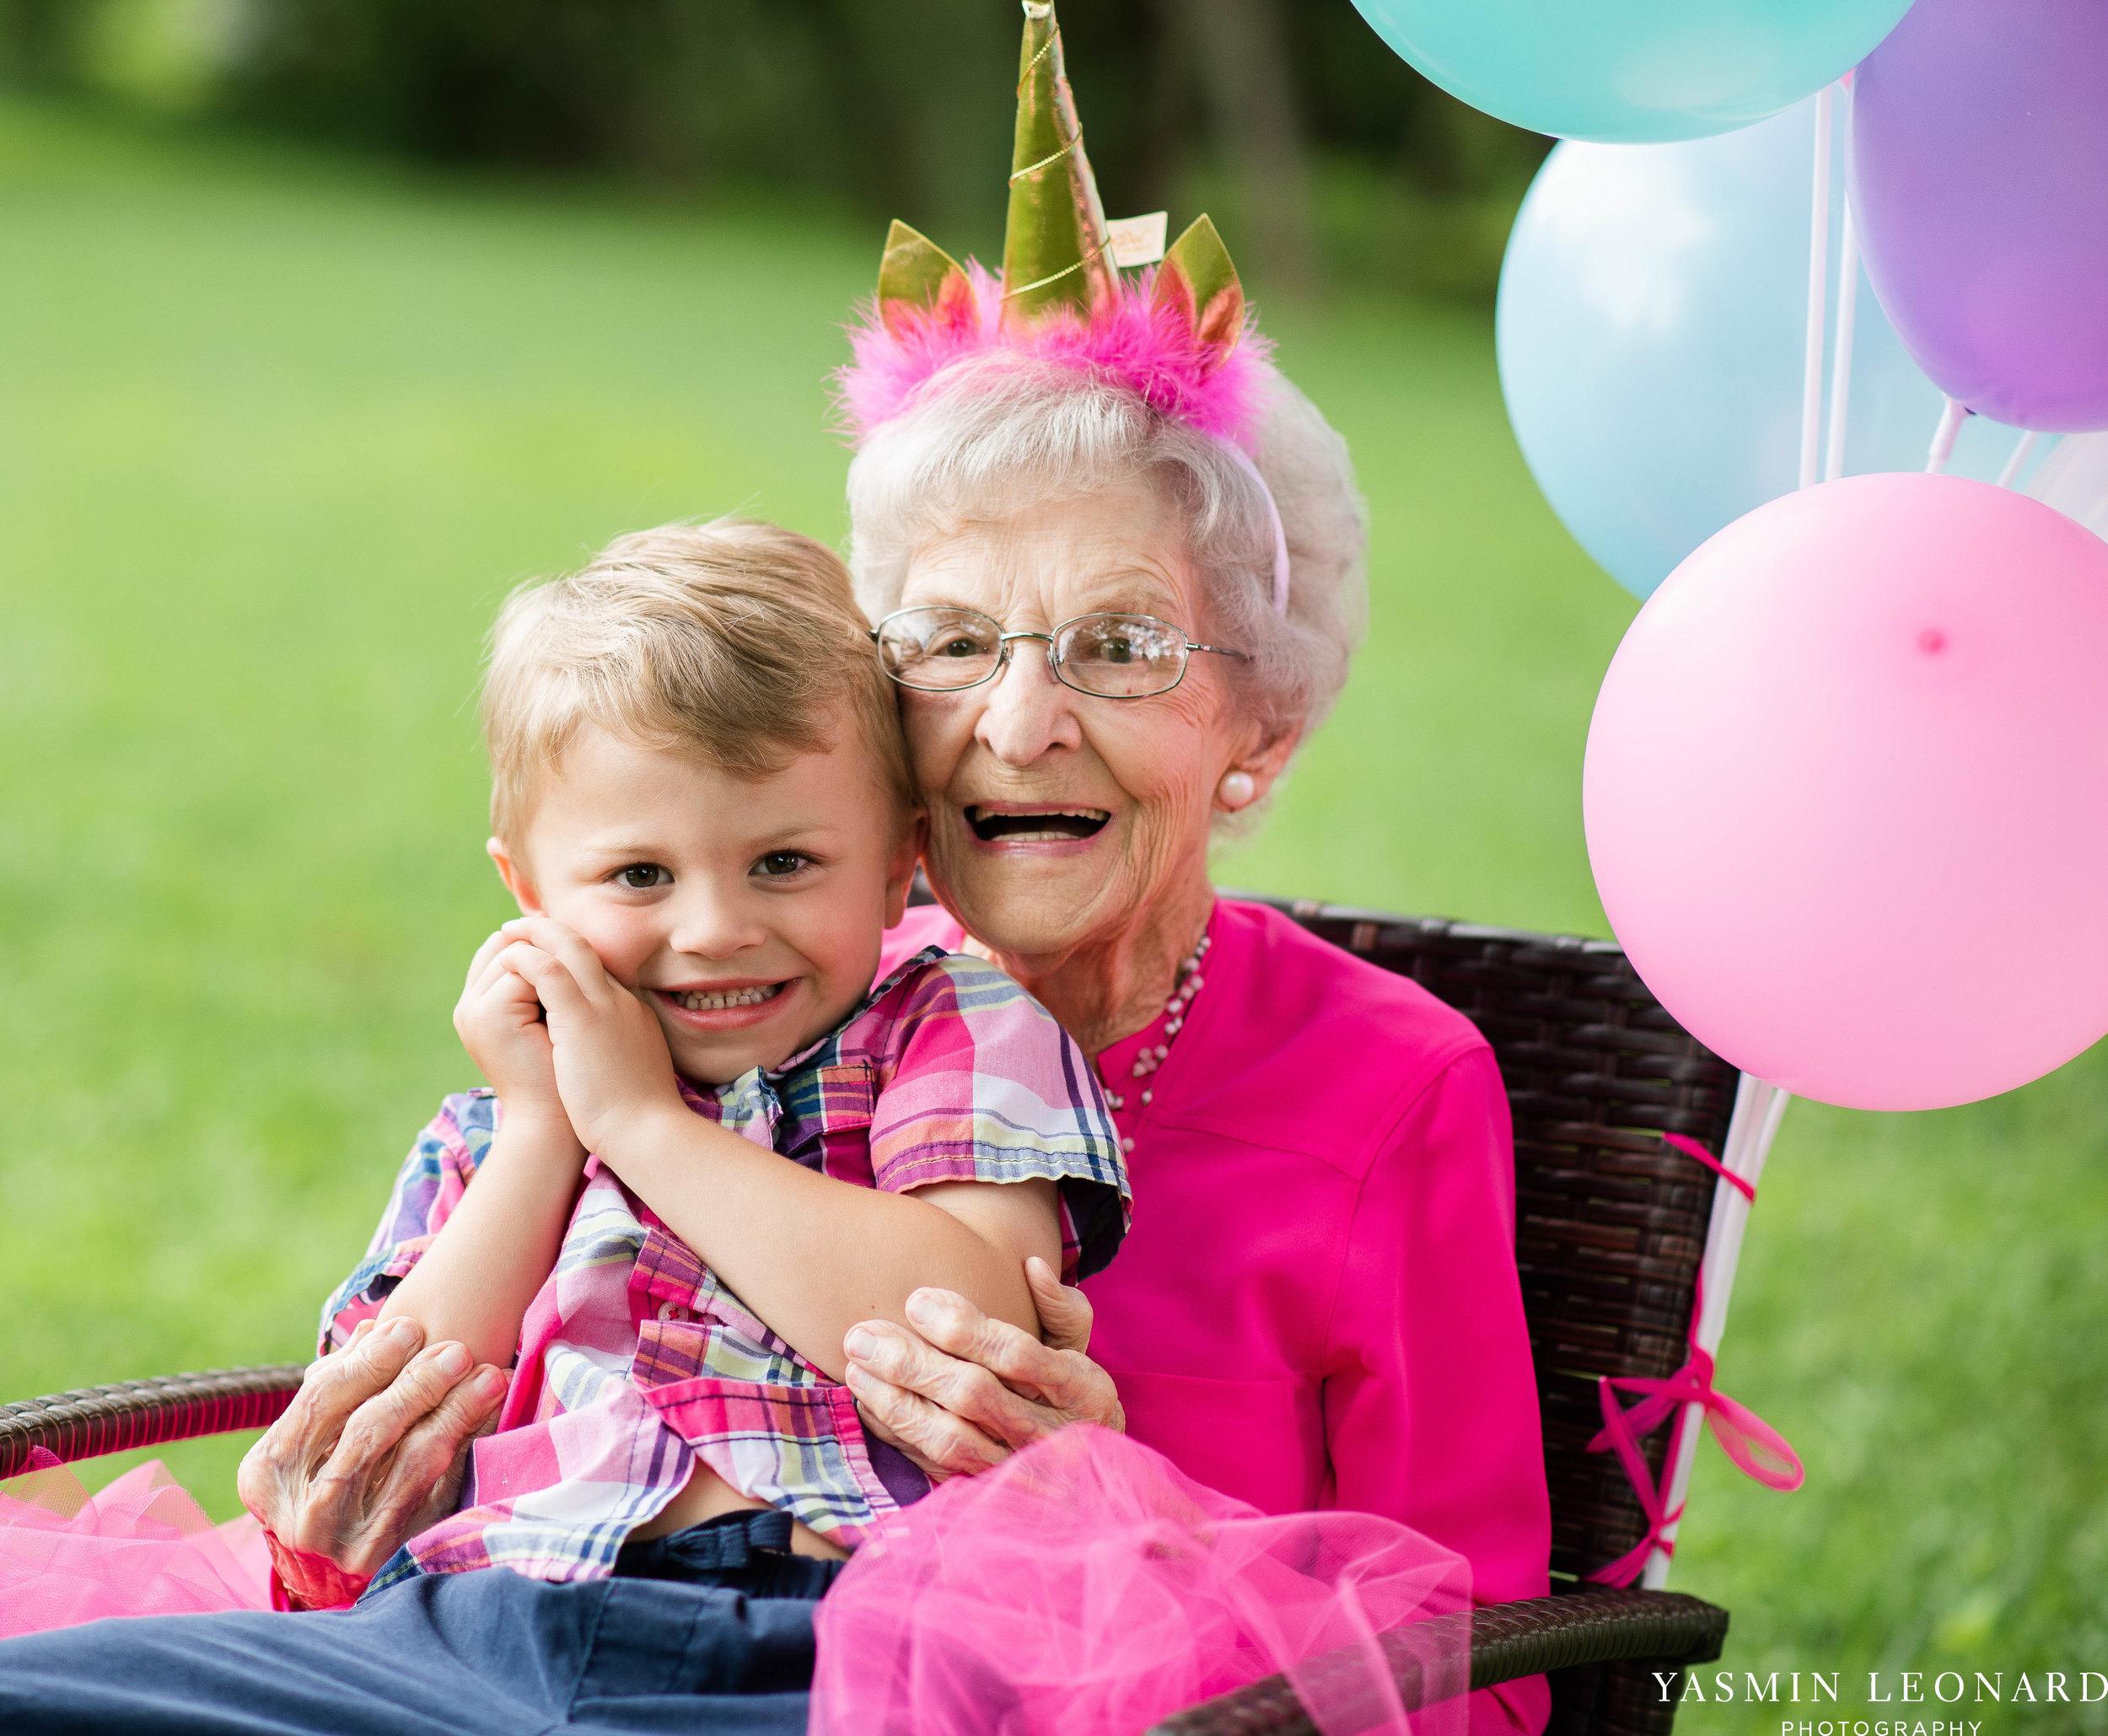 99 Year Old Birthday - Great Grandma Birthday Session - Grandma Birthday Session - 99 years Old - Adult Birthday Session - Four Generations-5.jpg